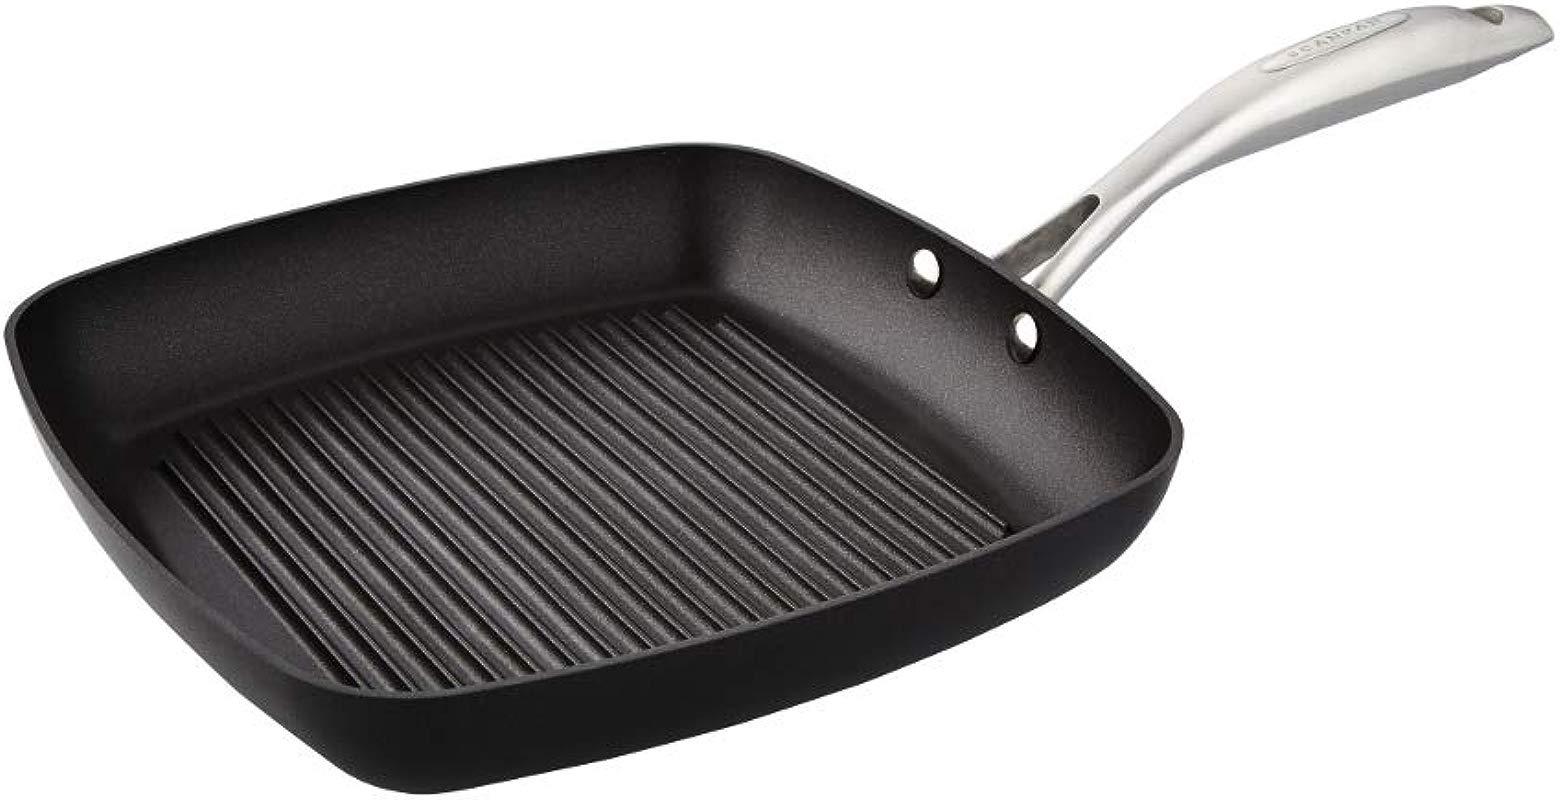 Scanpan Pro IQ 10 5 Inch Grill Pan